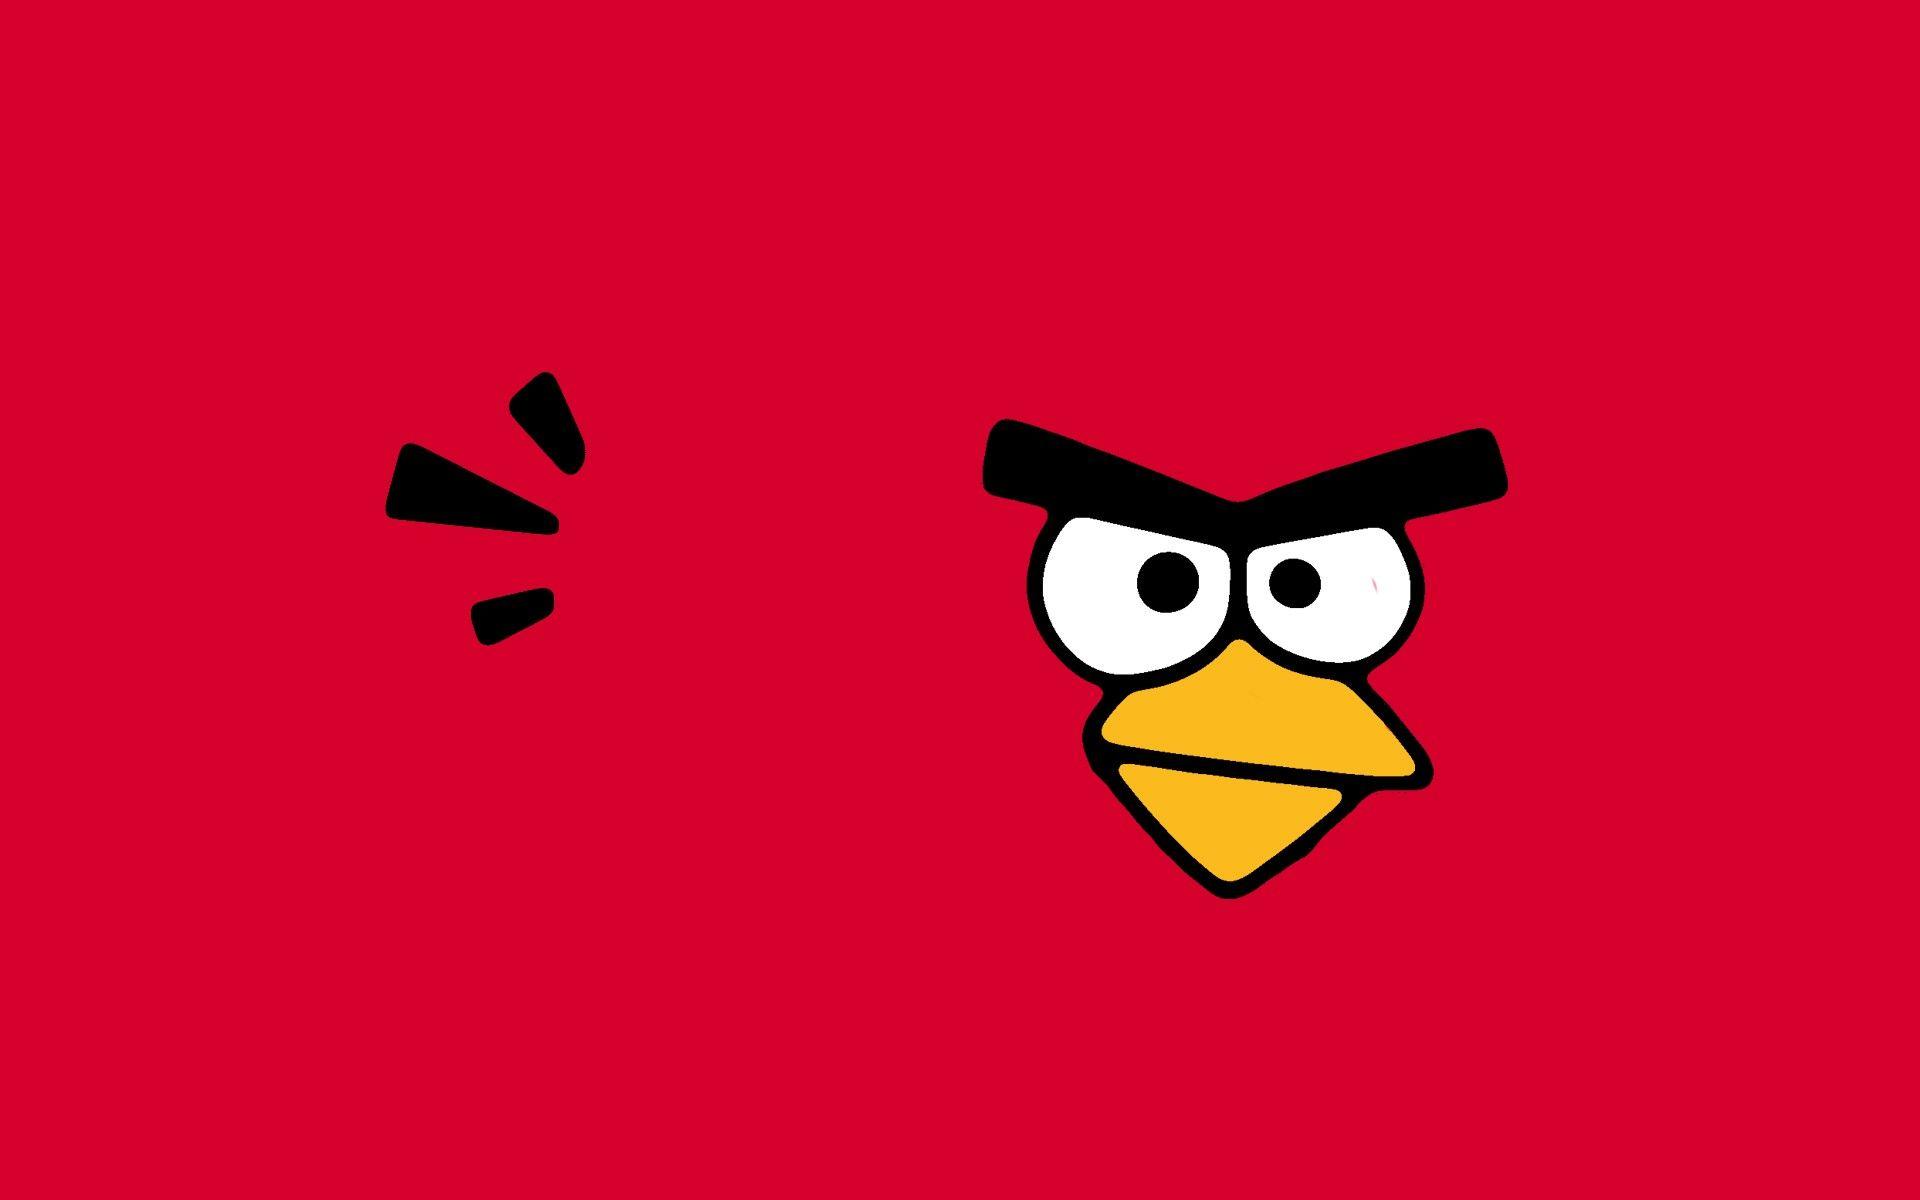 Angry Birds Wallpaper Angry Birds Wallpaper Angry Bird Wallpaper Red Angry Bird Wallpaper